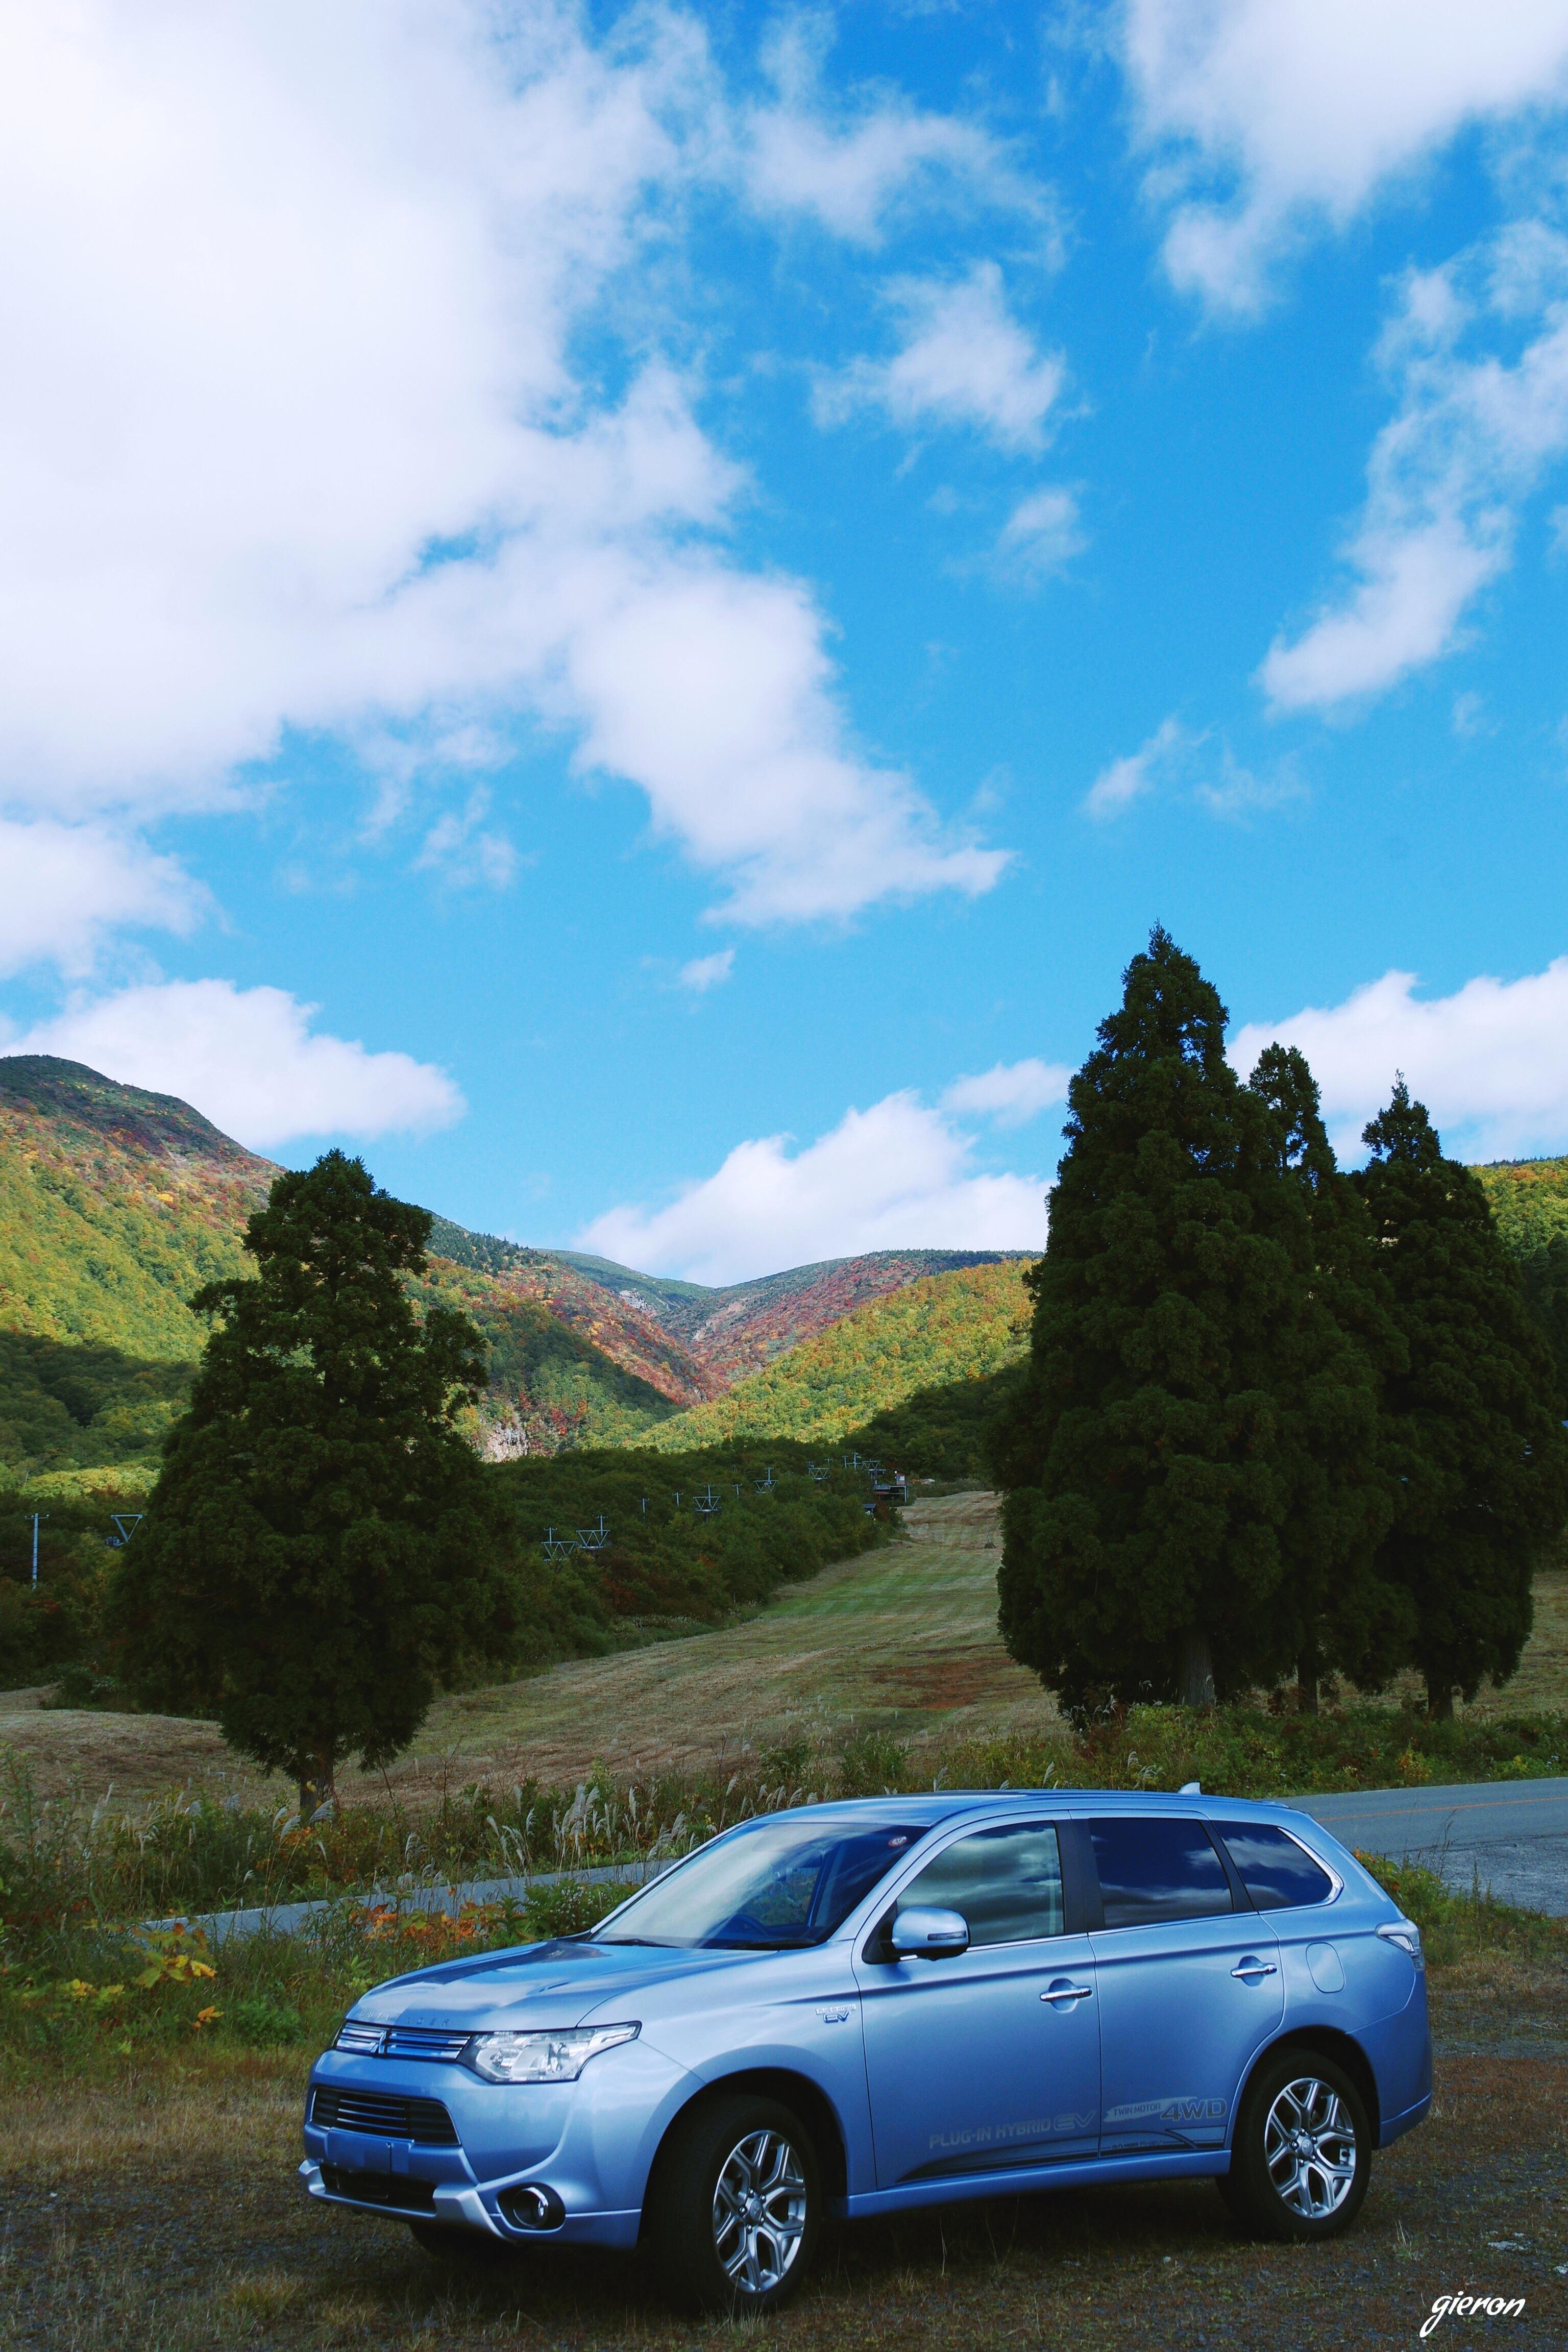 Mitsubishi Outlander phev アウトランダーPHEV 東北ドライブ旅行2017